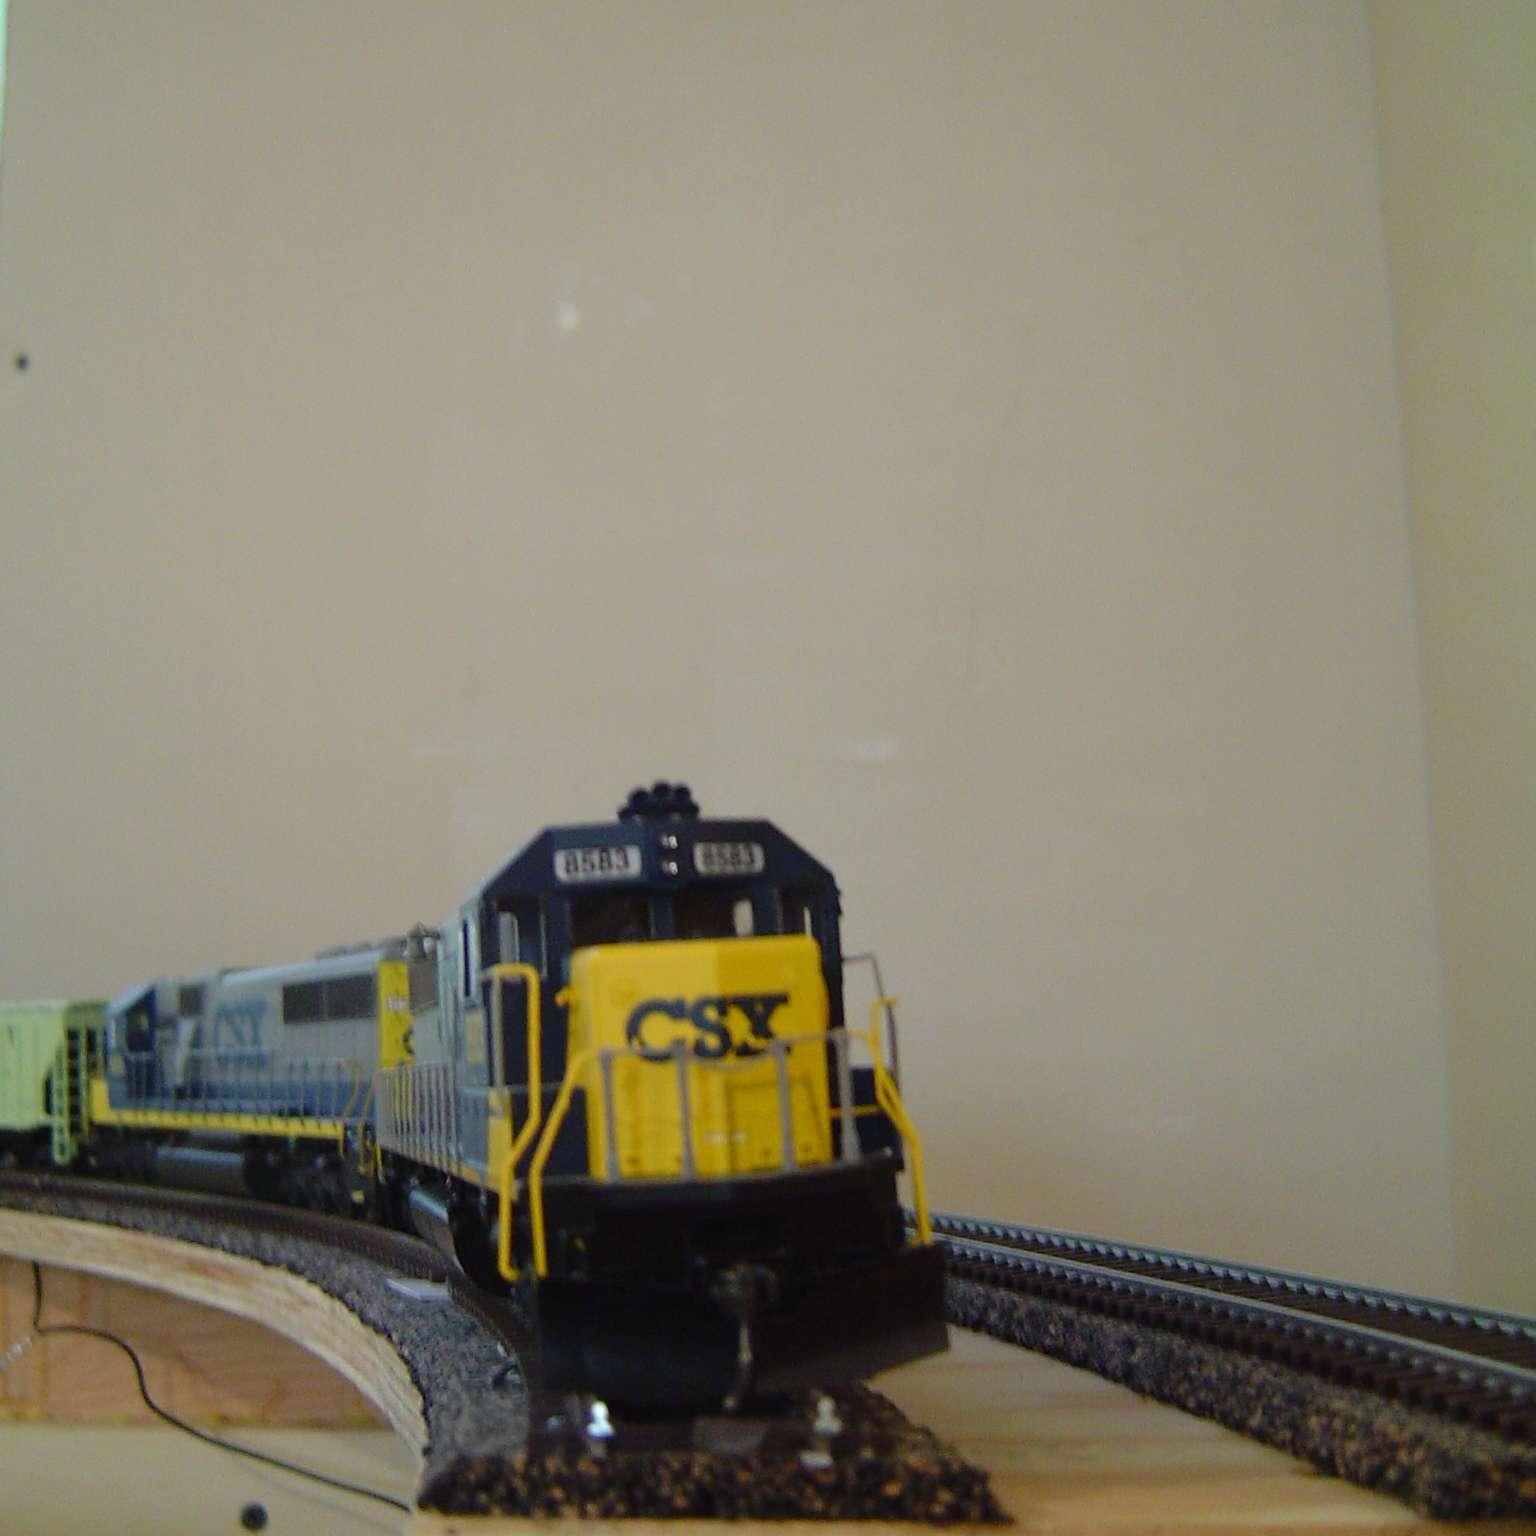 Model train on track